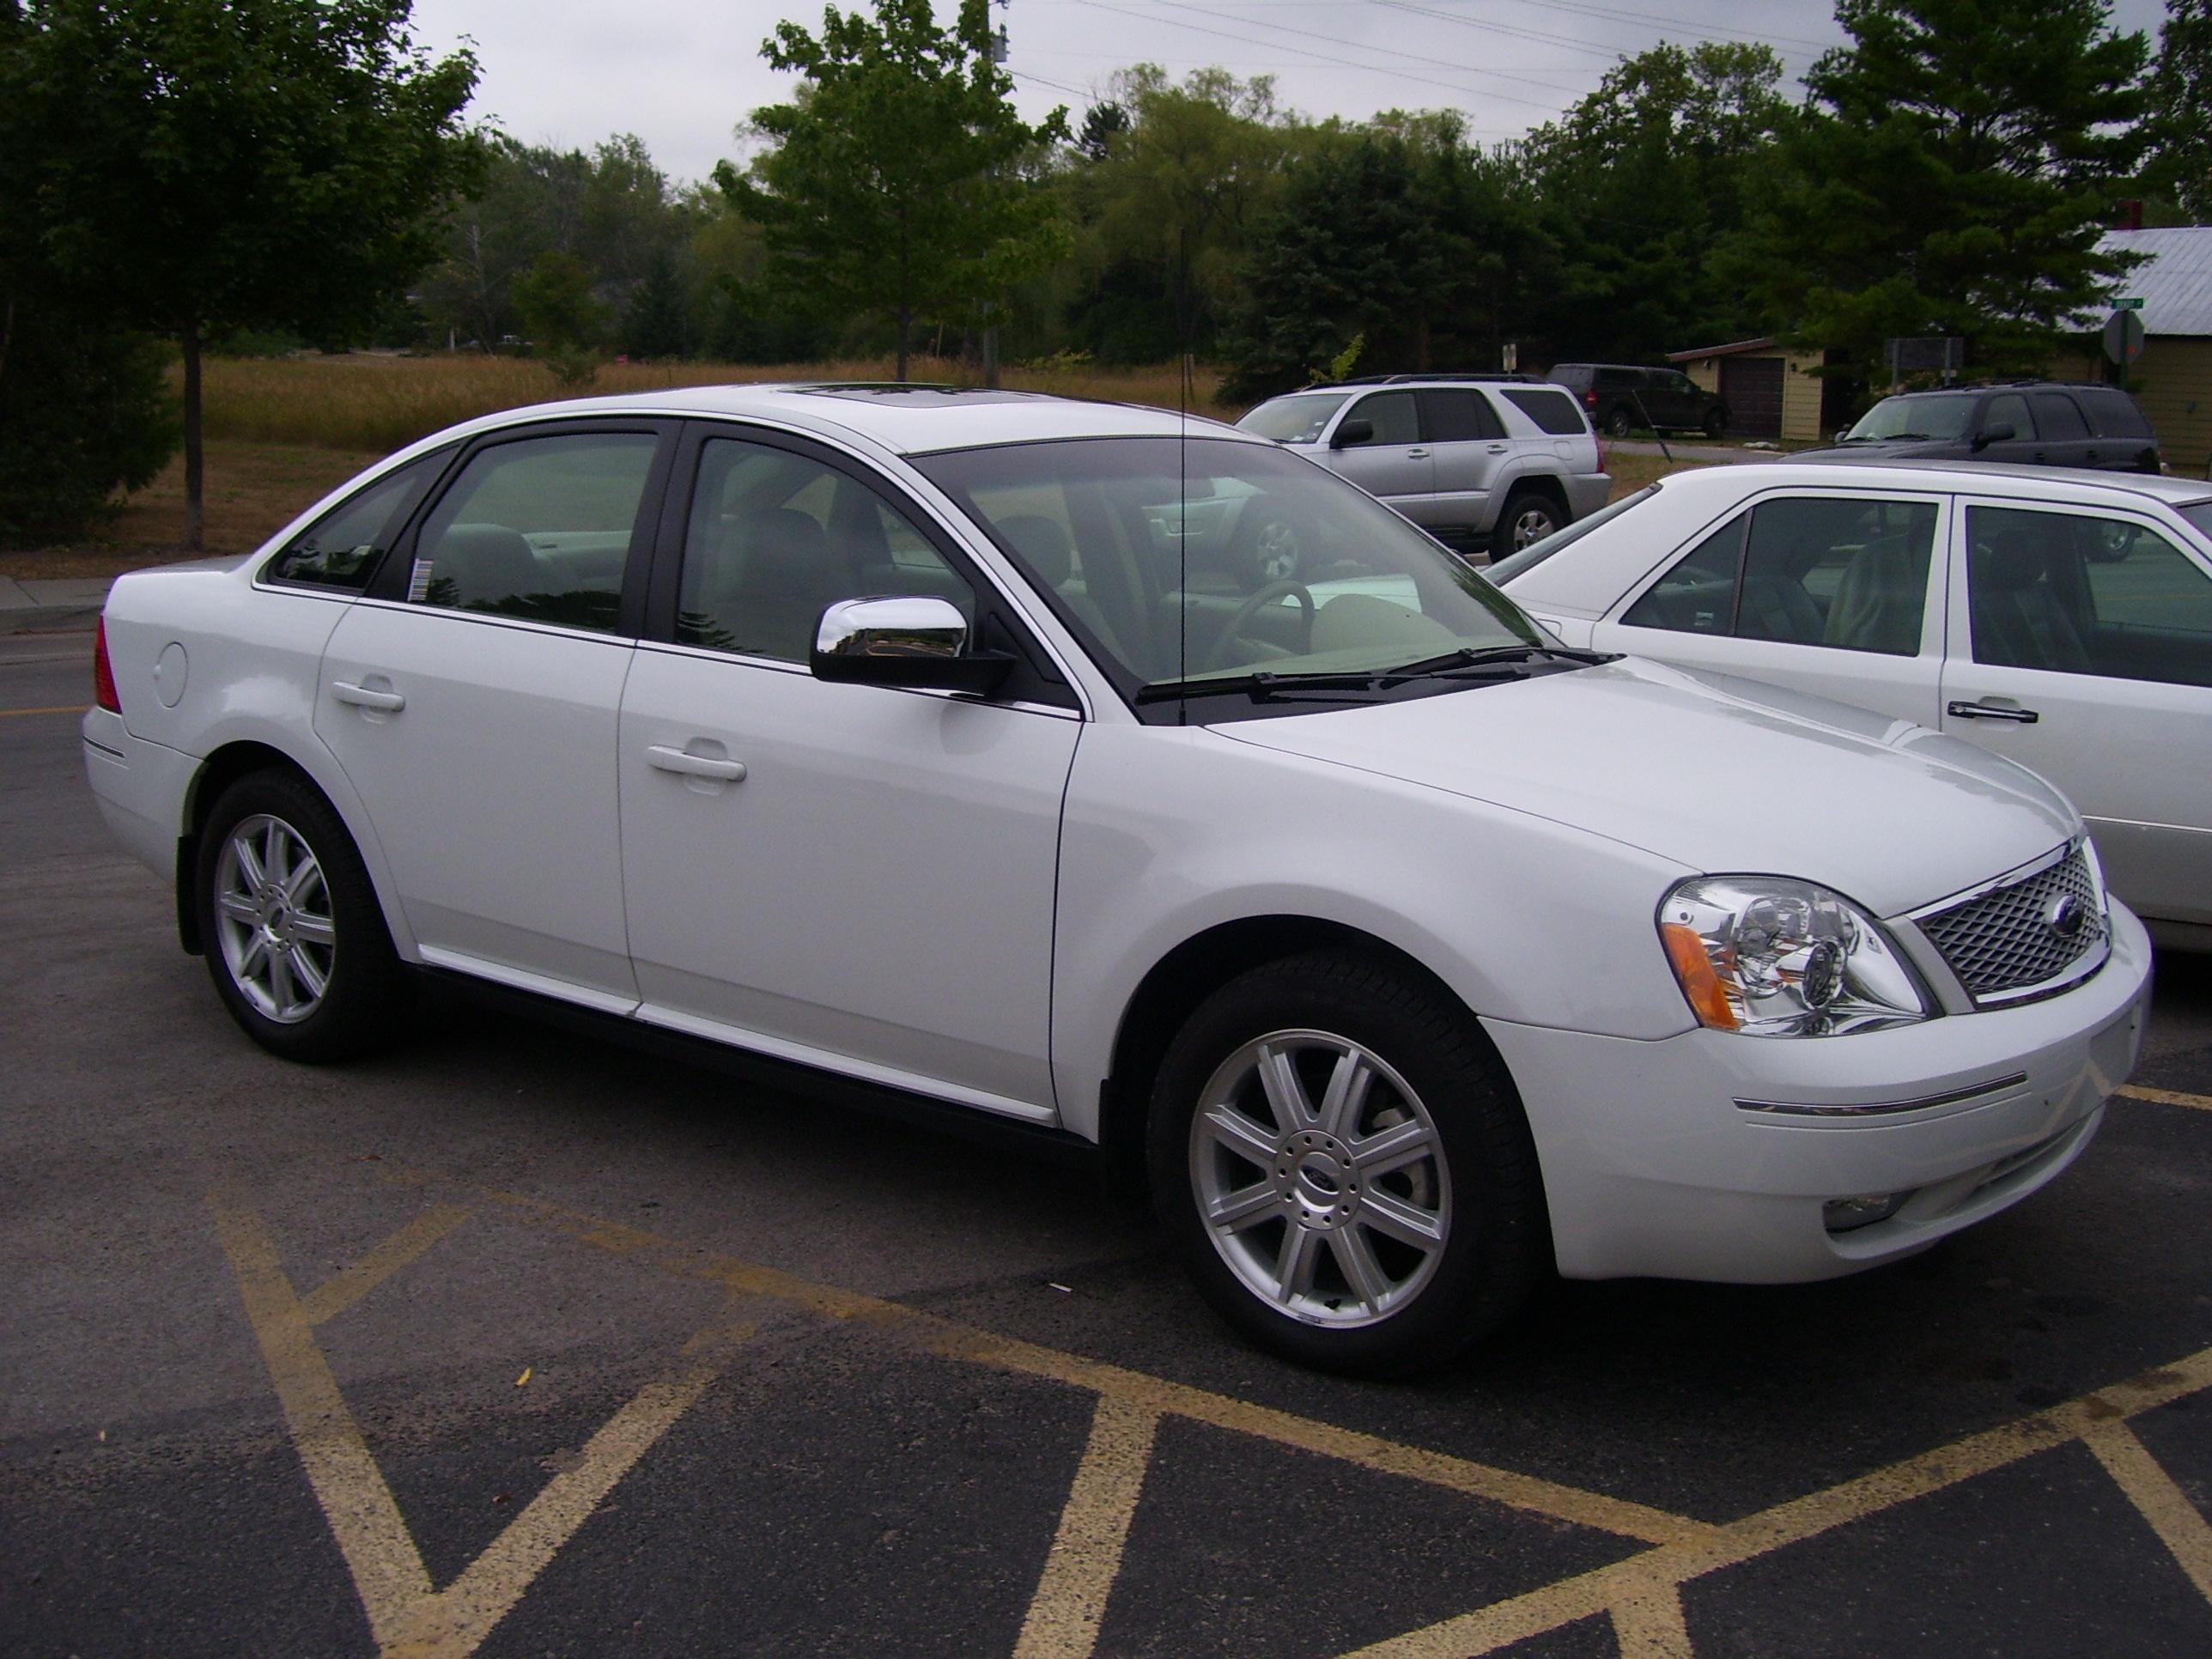 Ford Five-Hundred 2007 foto - 3